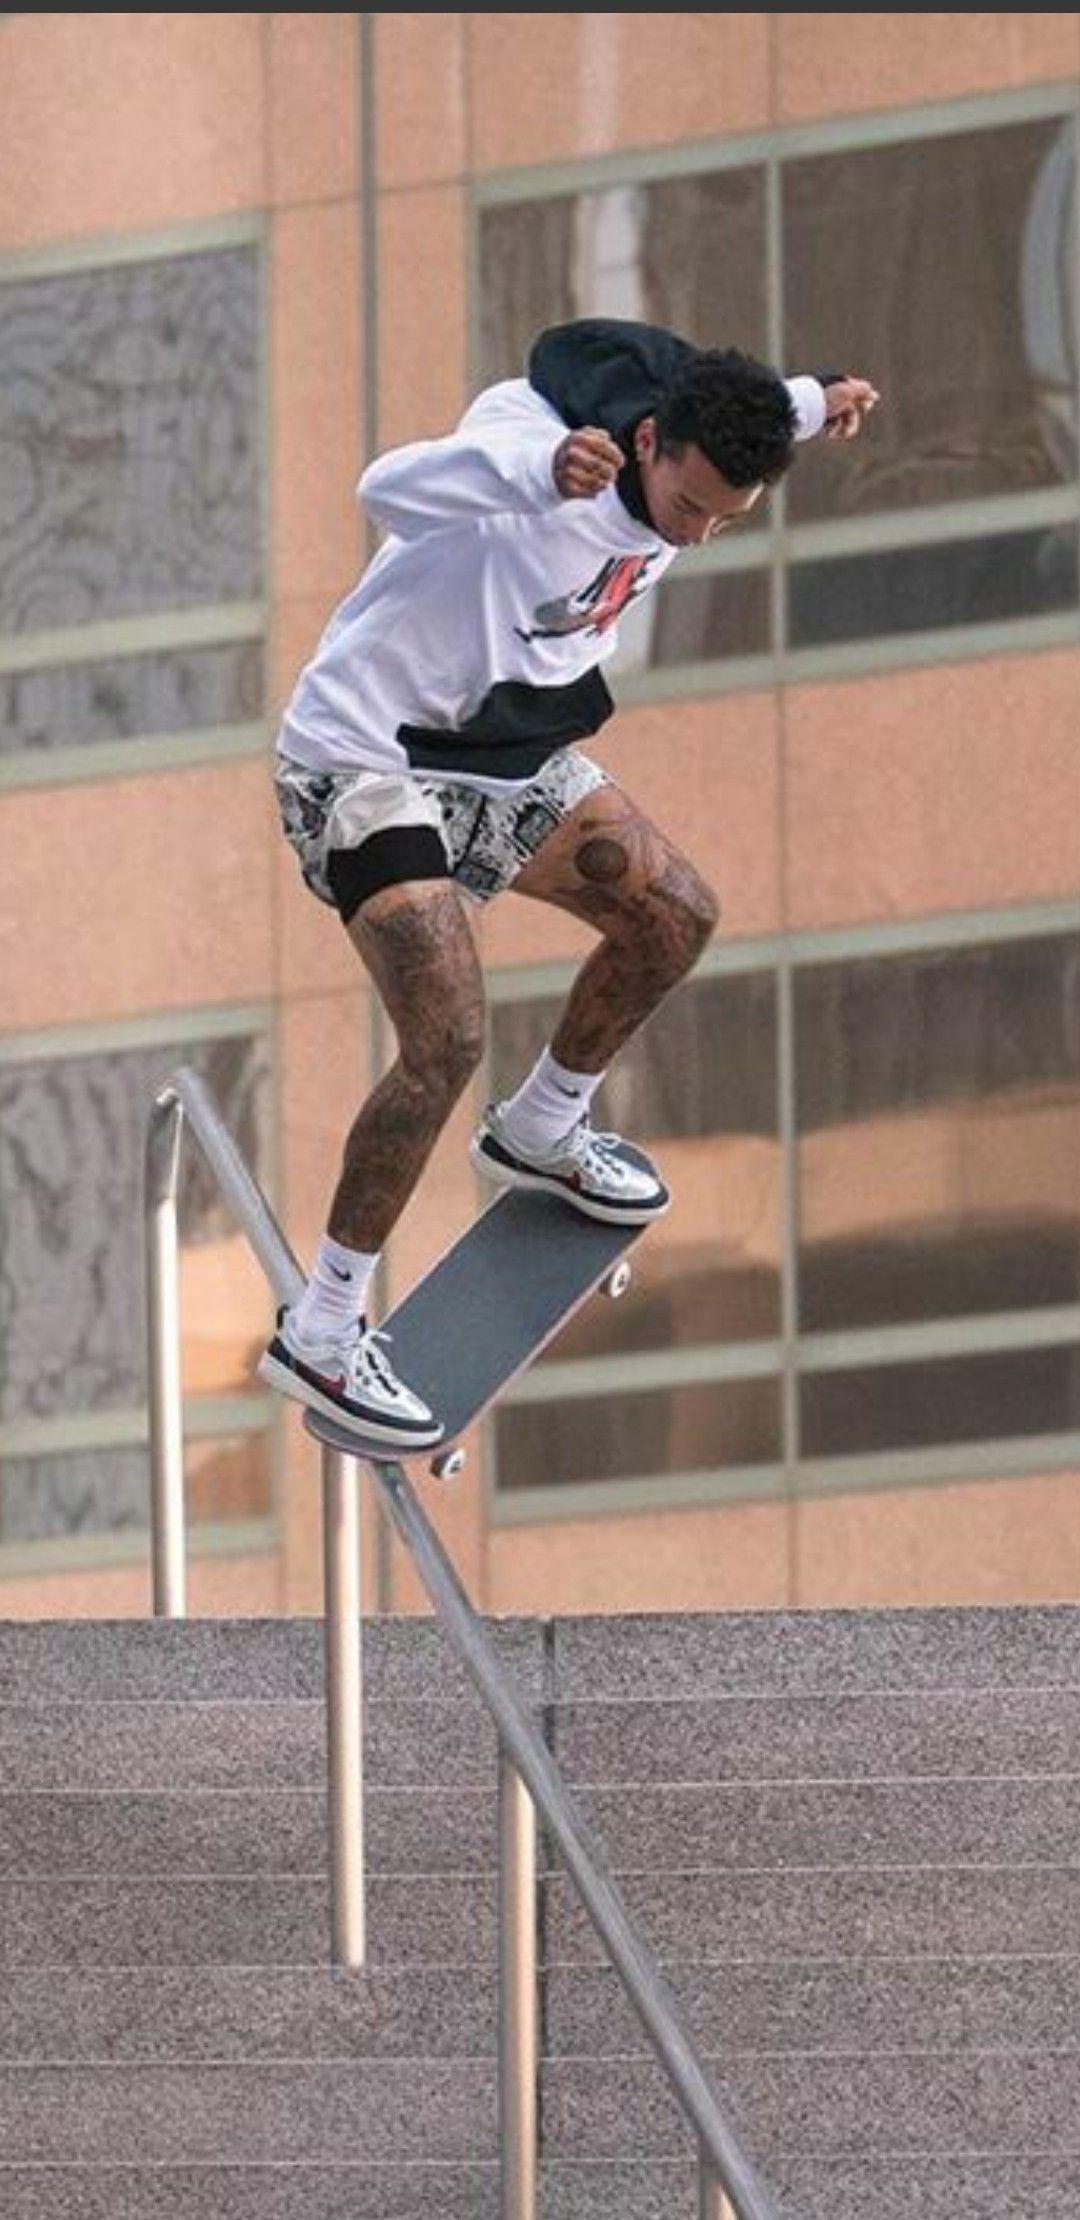 Nike SB Nyjah Free 2 Skate Shoe. Nike GB in 2020 Skate